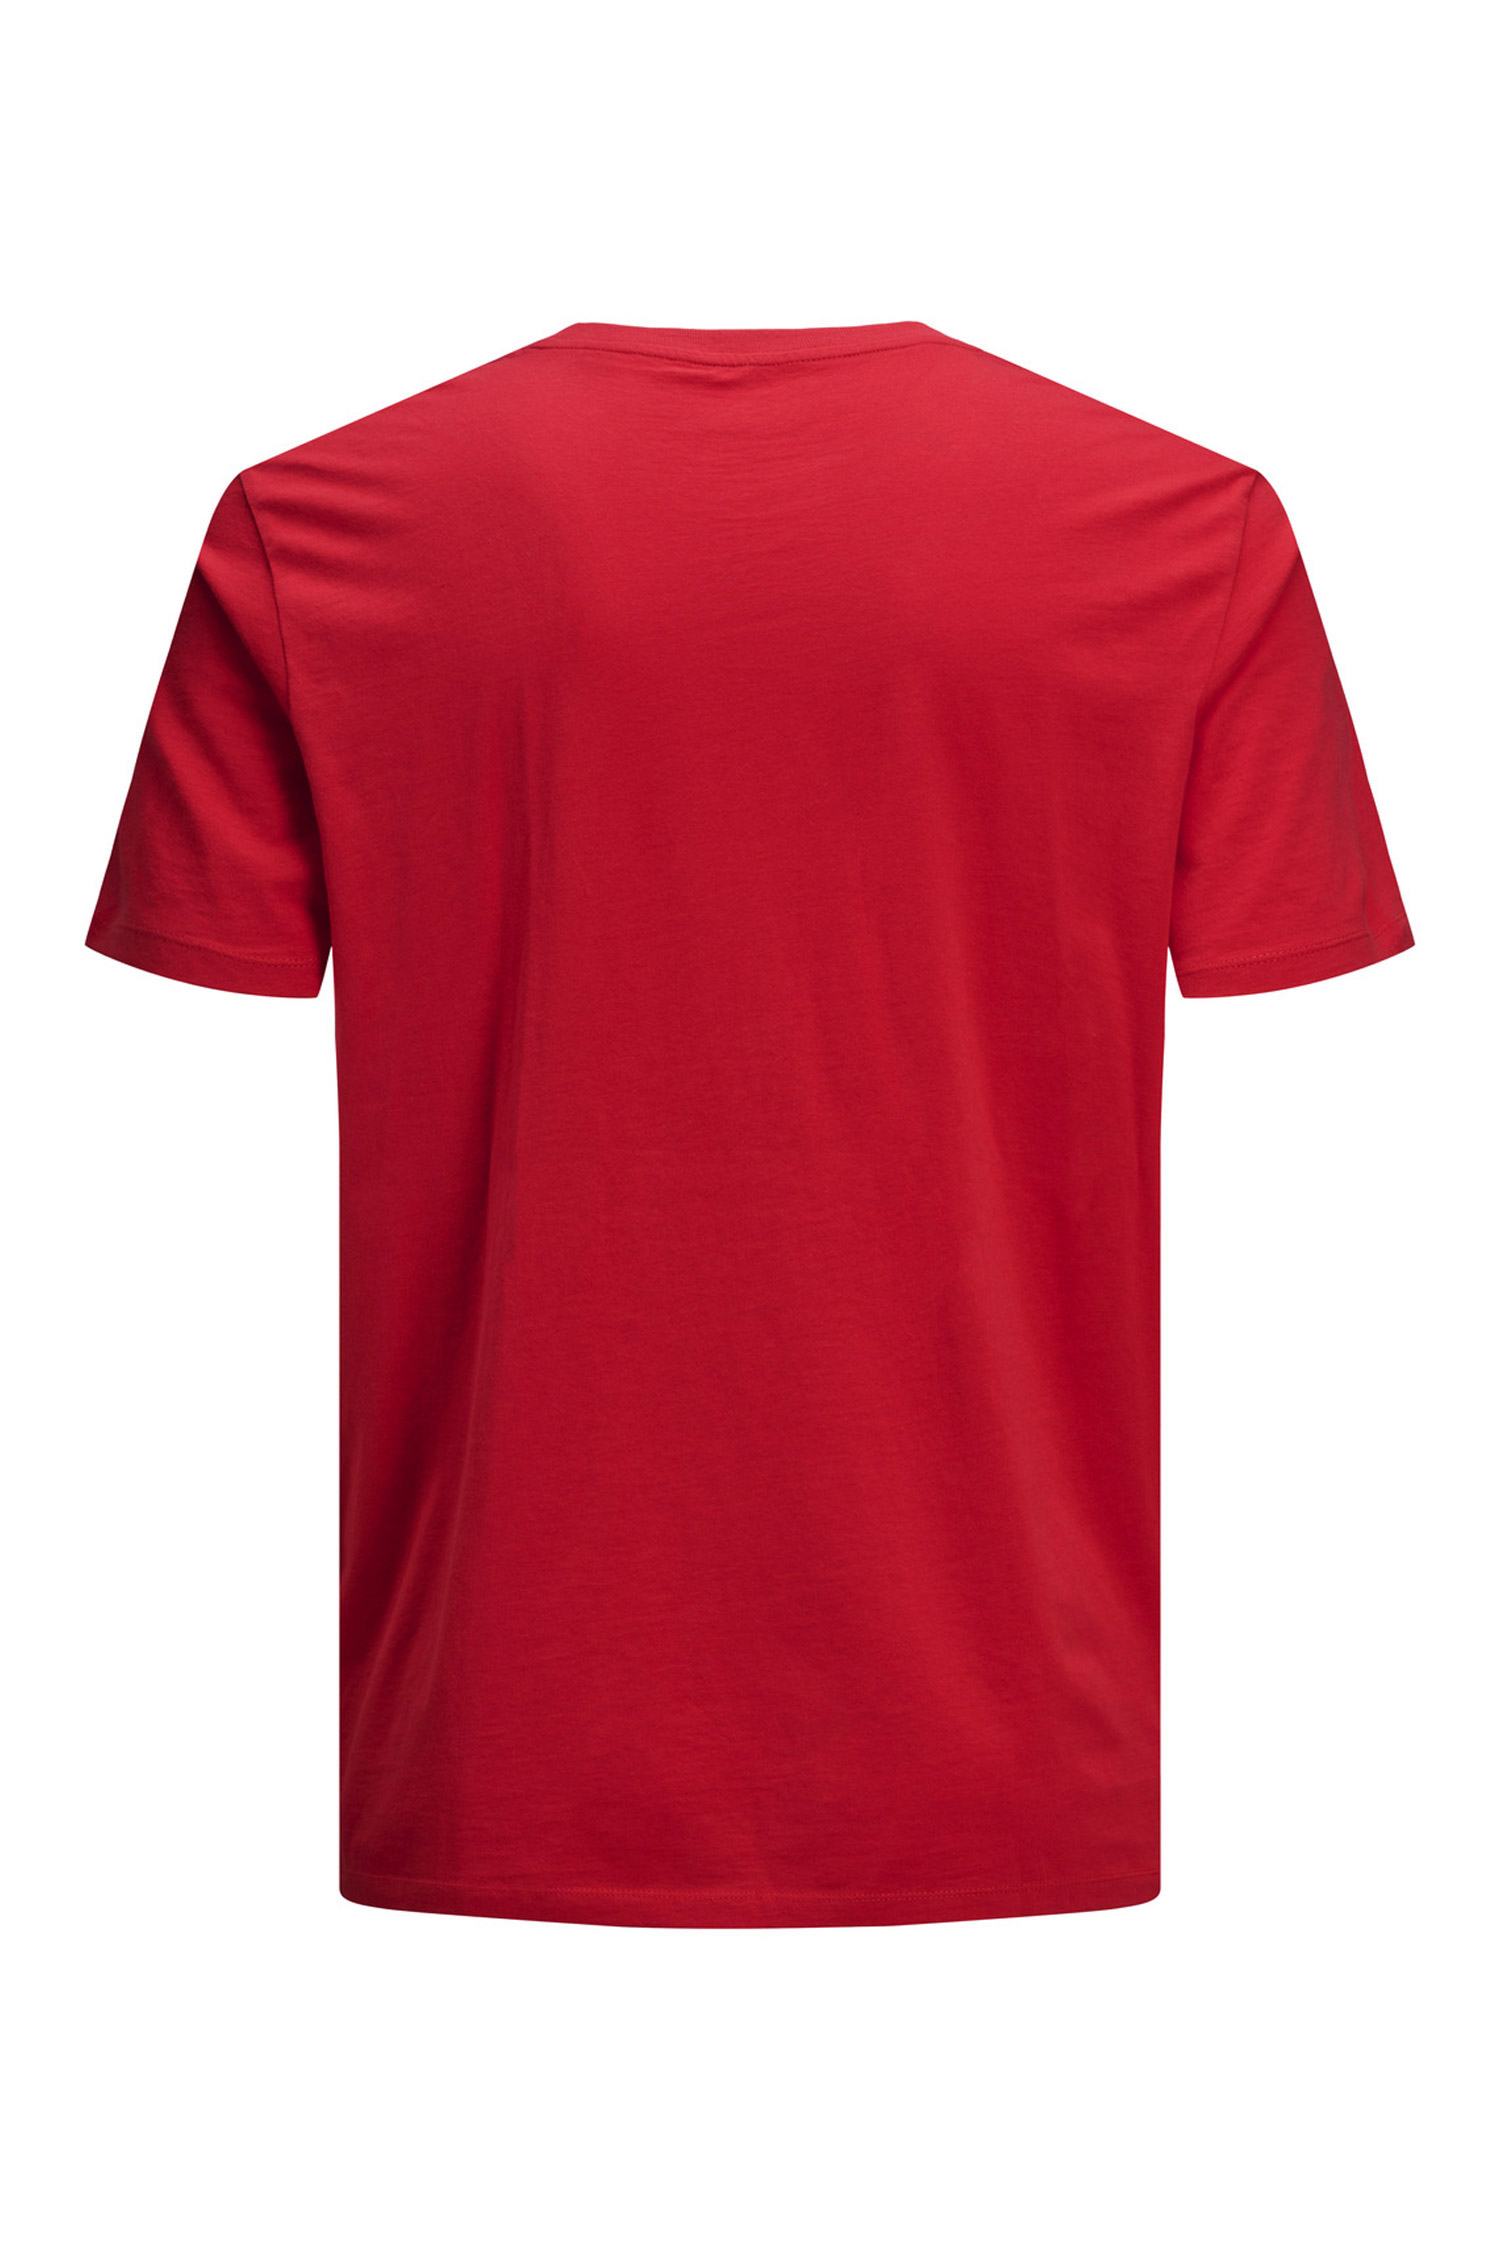 Sport, Camisetas M. Corta, 110078, ROJO | Zoom